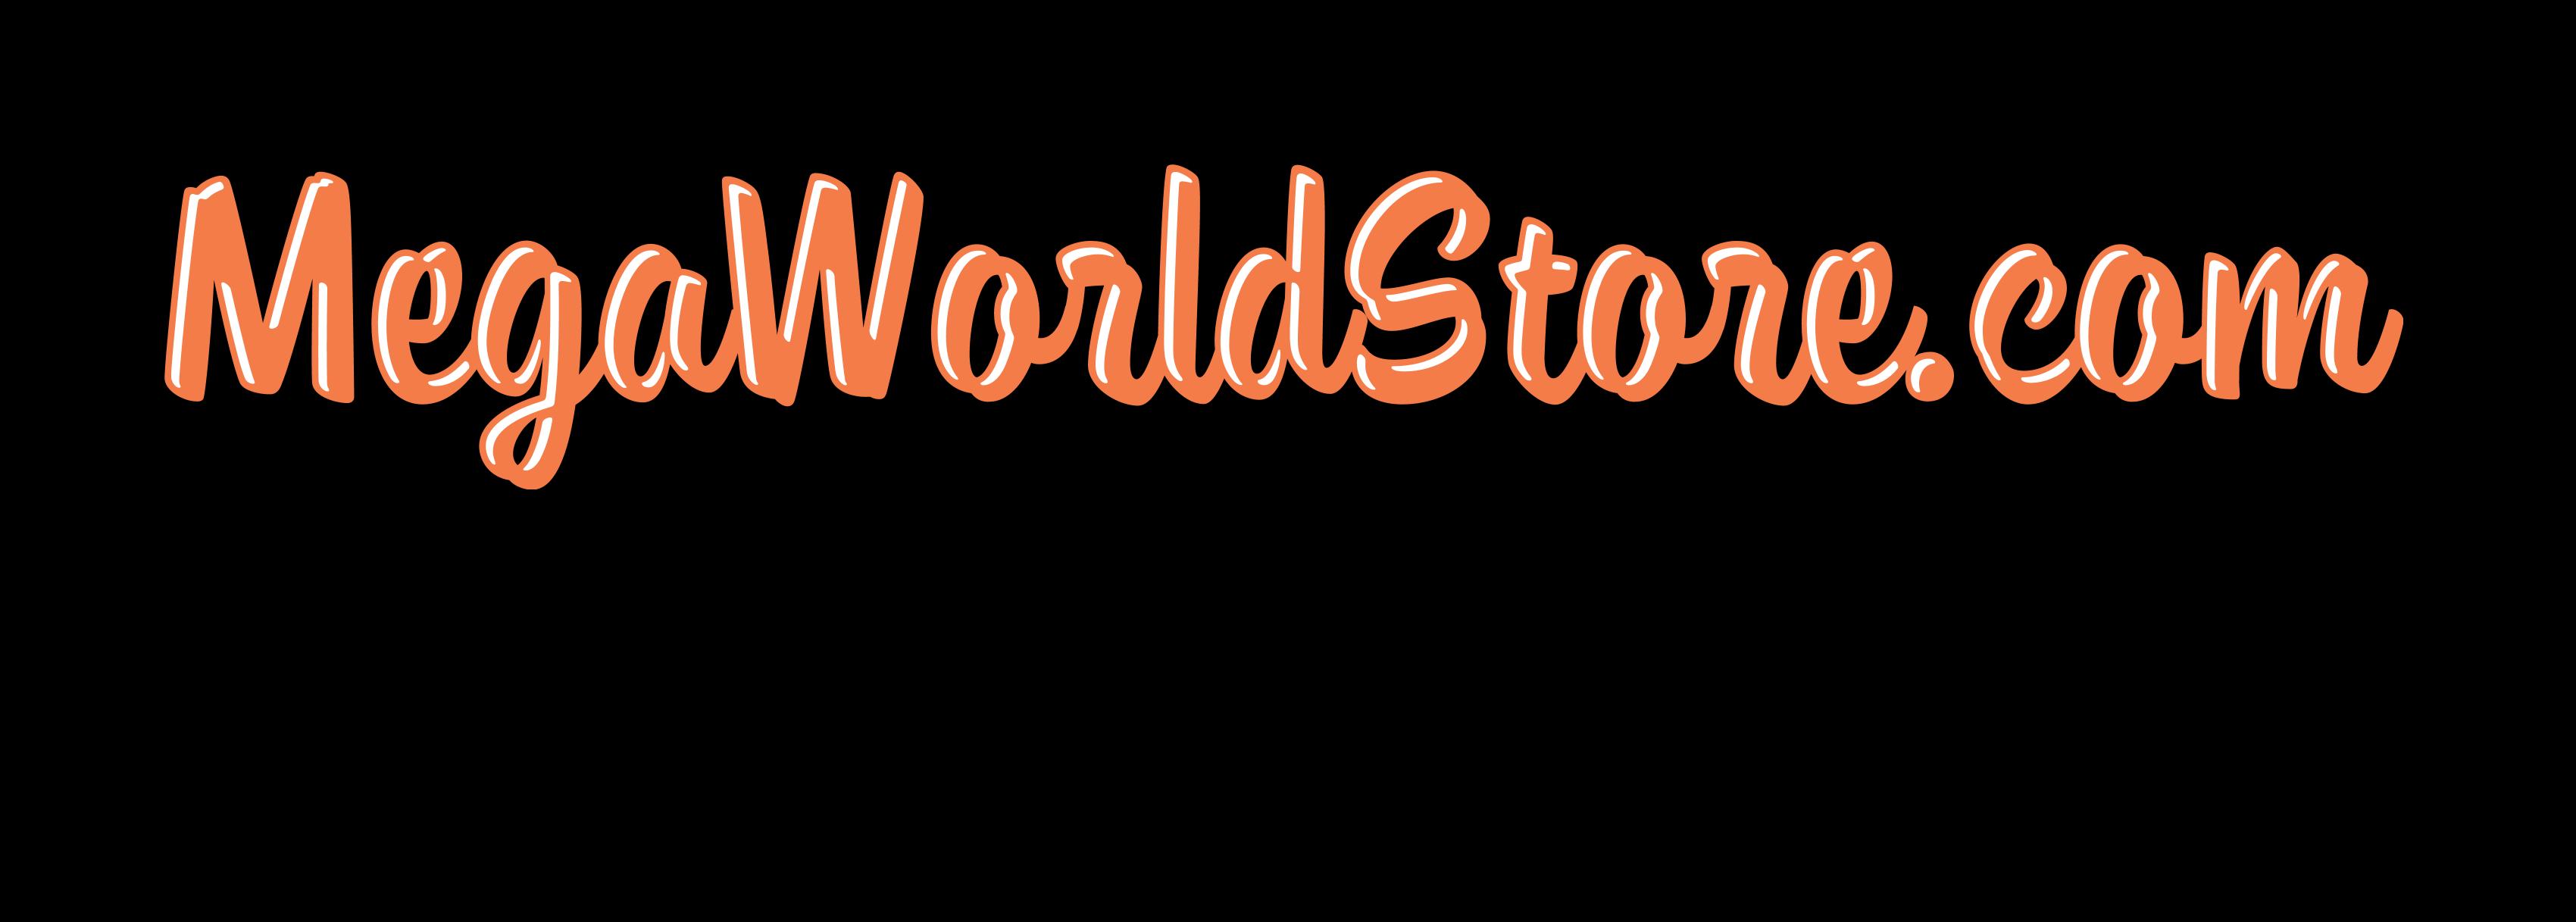 MegaWorldStore.com